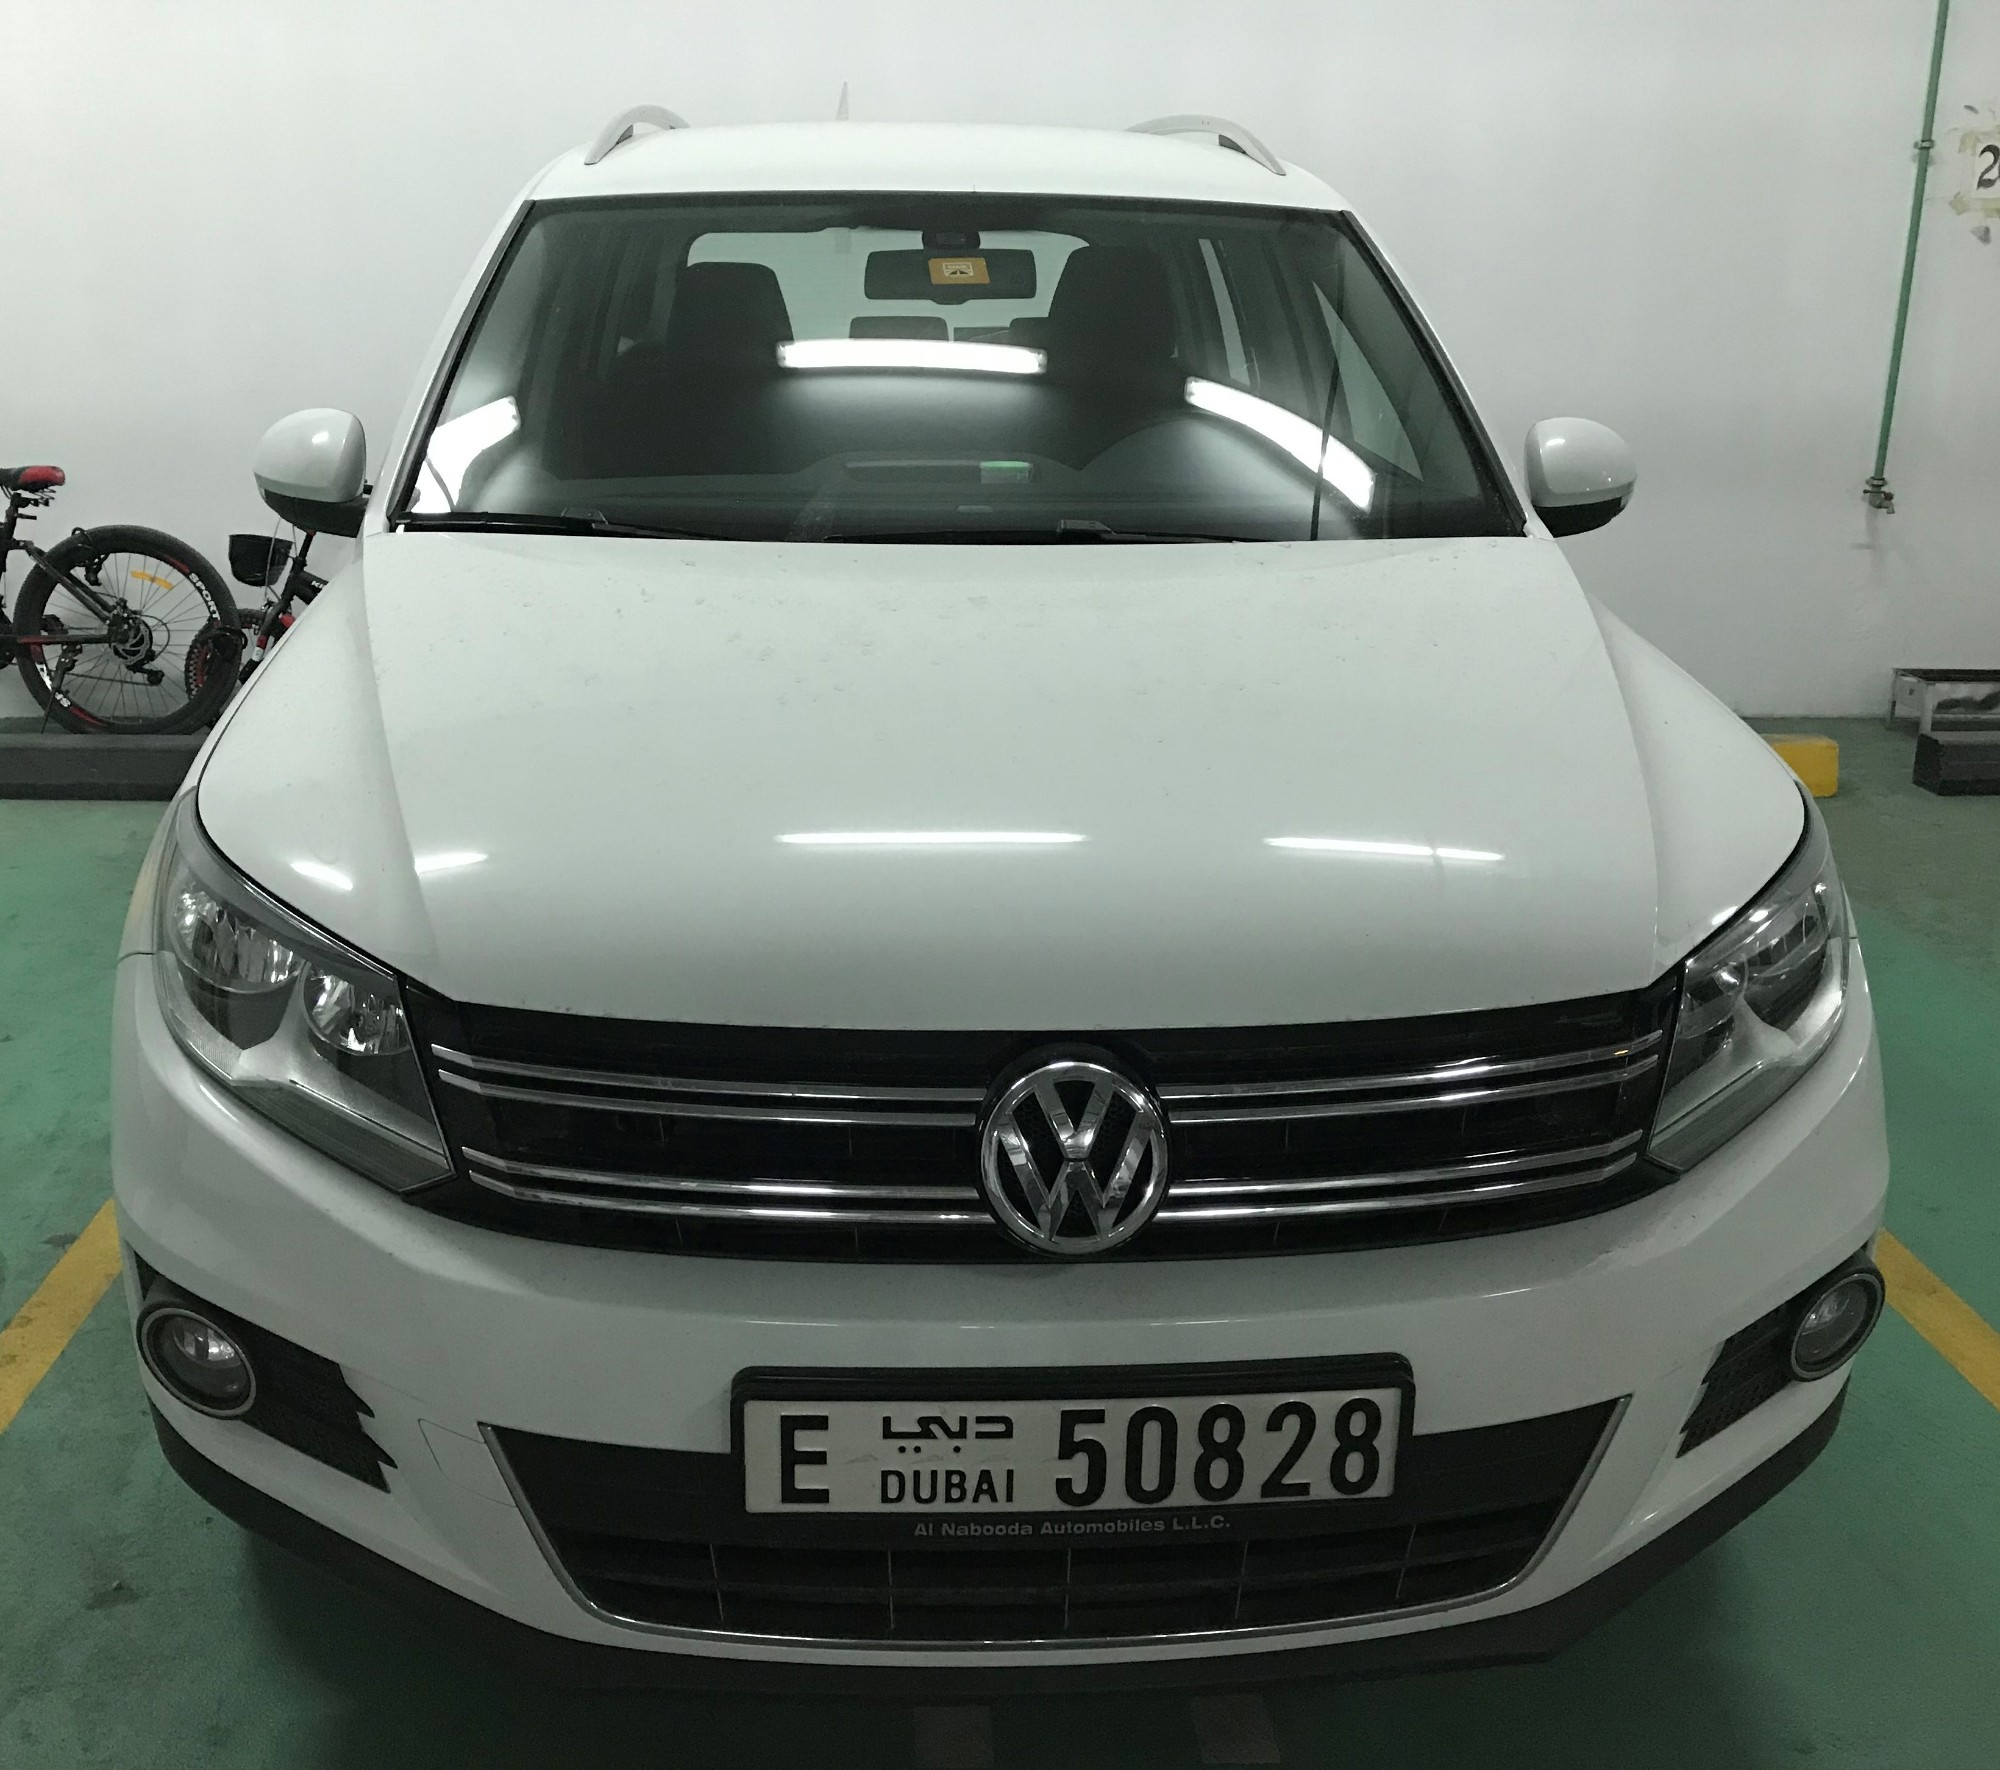 Used Volkswagen Tiguan 2.0 TSI 4Motion 2015 (866090